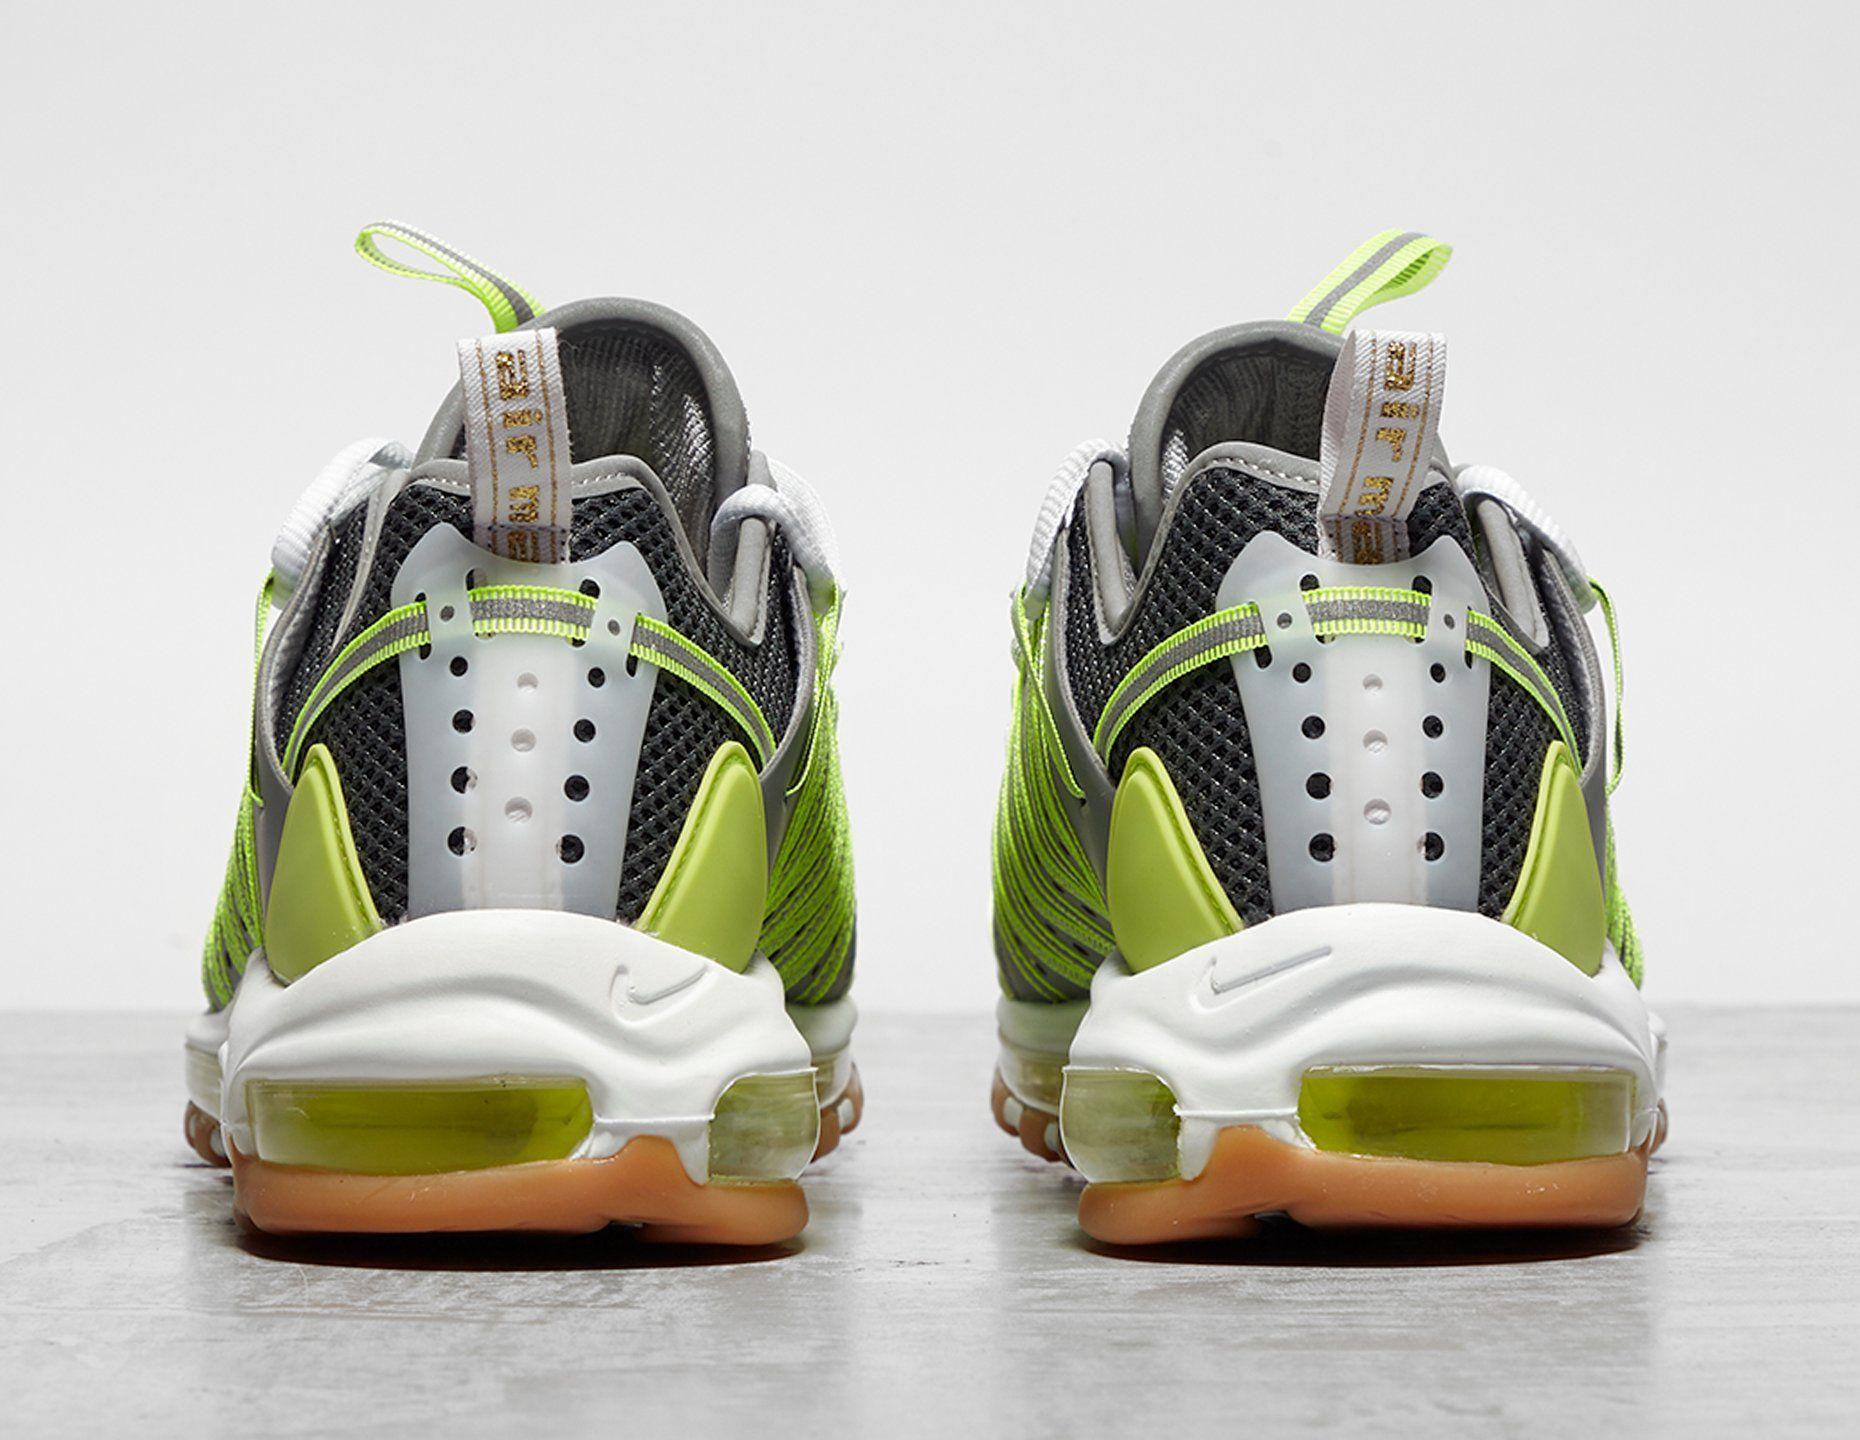 Nike x CLOT Air Max Haven